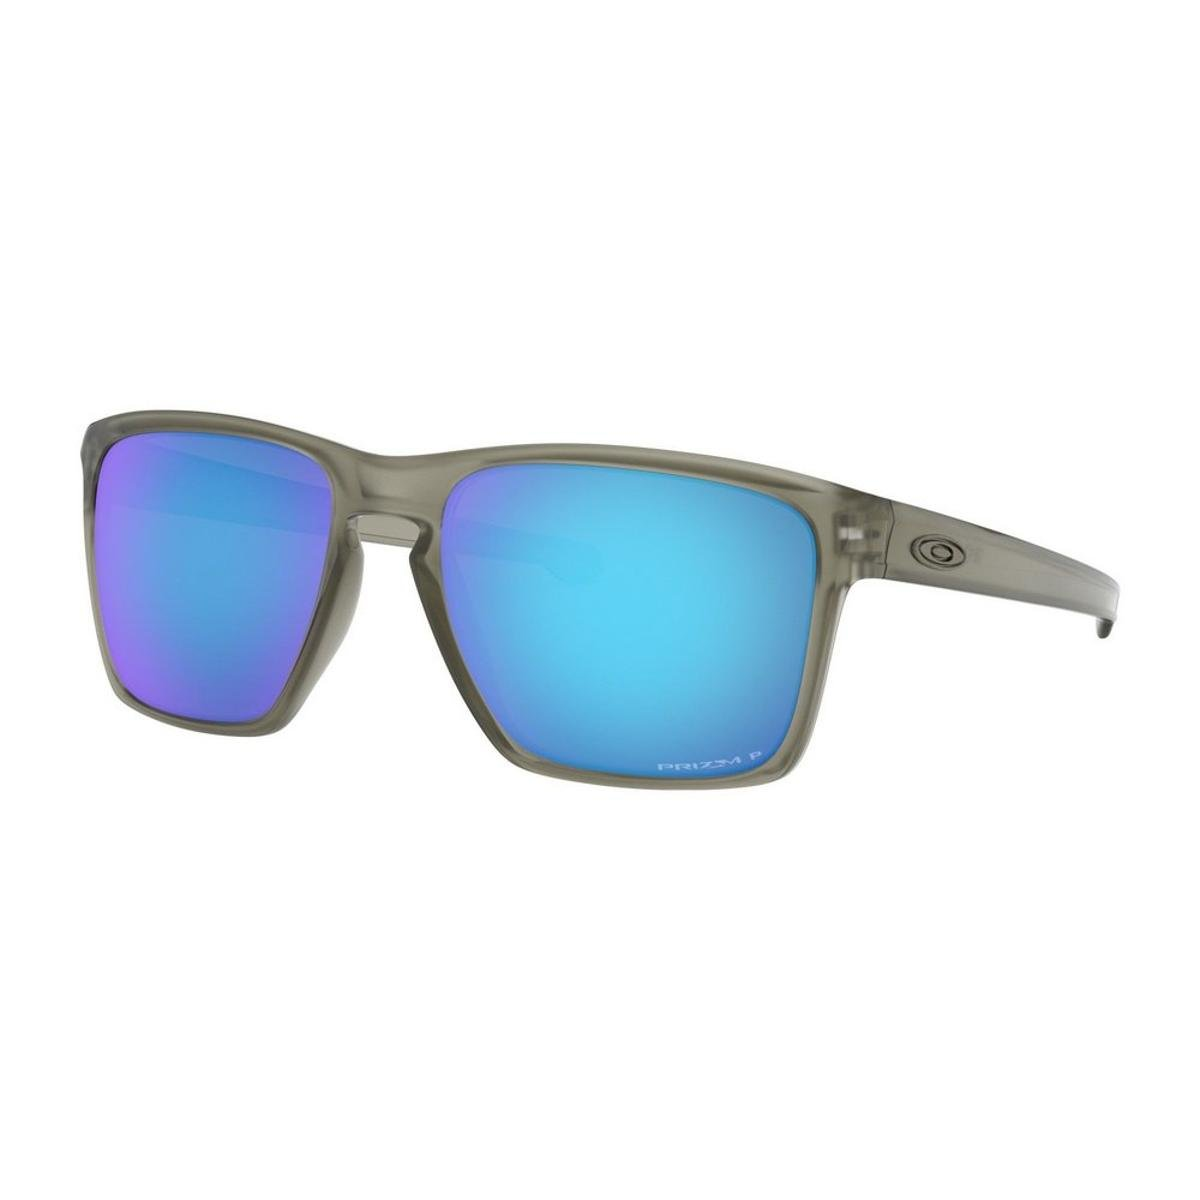 386cd39286d4a Óculos de Sol Oakley Sliver XL OO9341 - Matte Grey Ink - Prizm Sapphire  Polarized - 18 57 - Preto e Dourado - Compre Agora